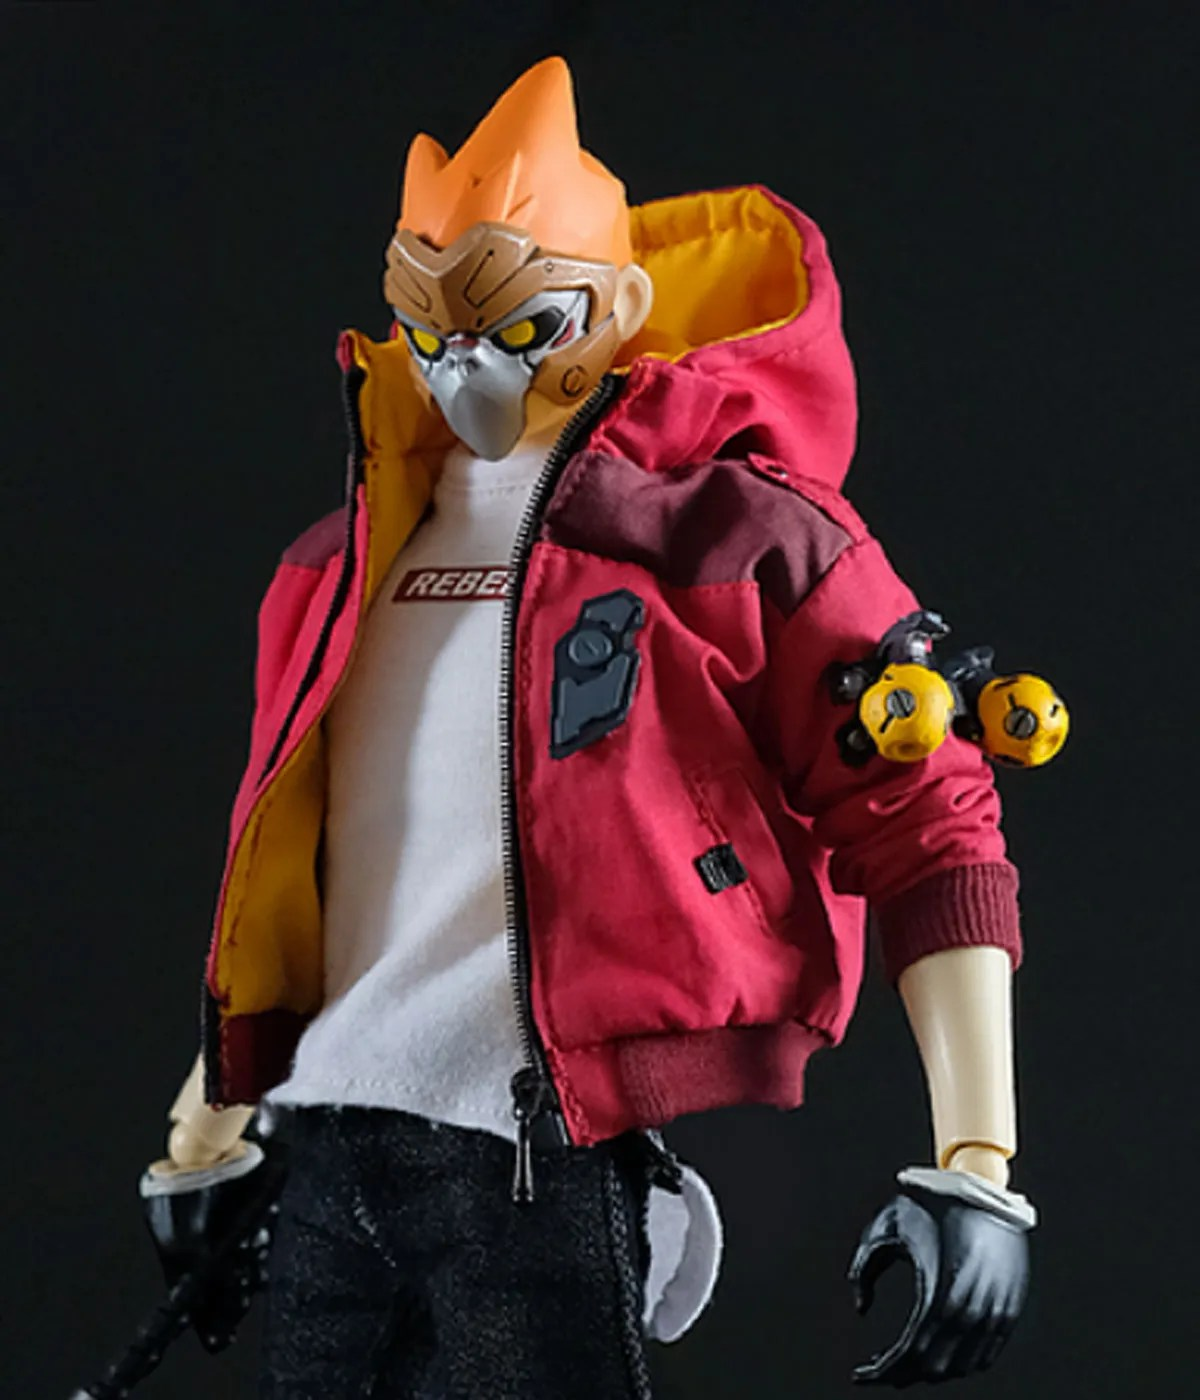 goku-no-fear-no-mercy-dragon-ball-jacket